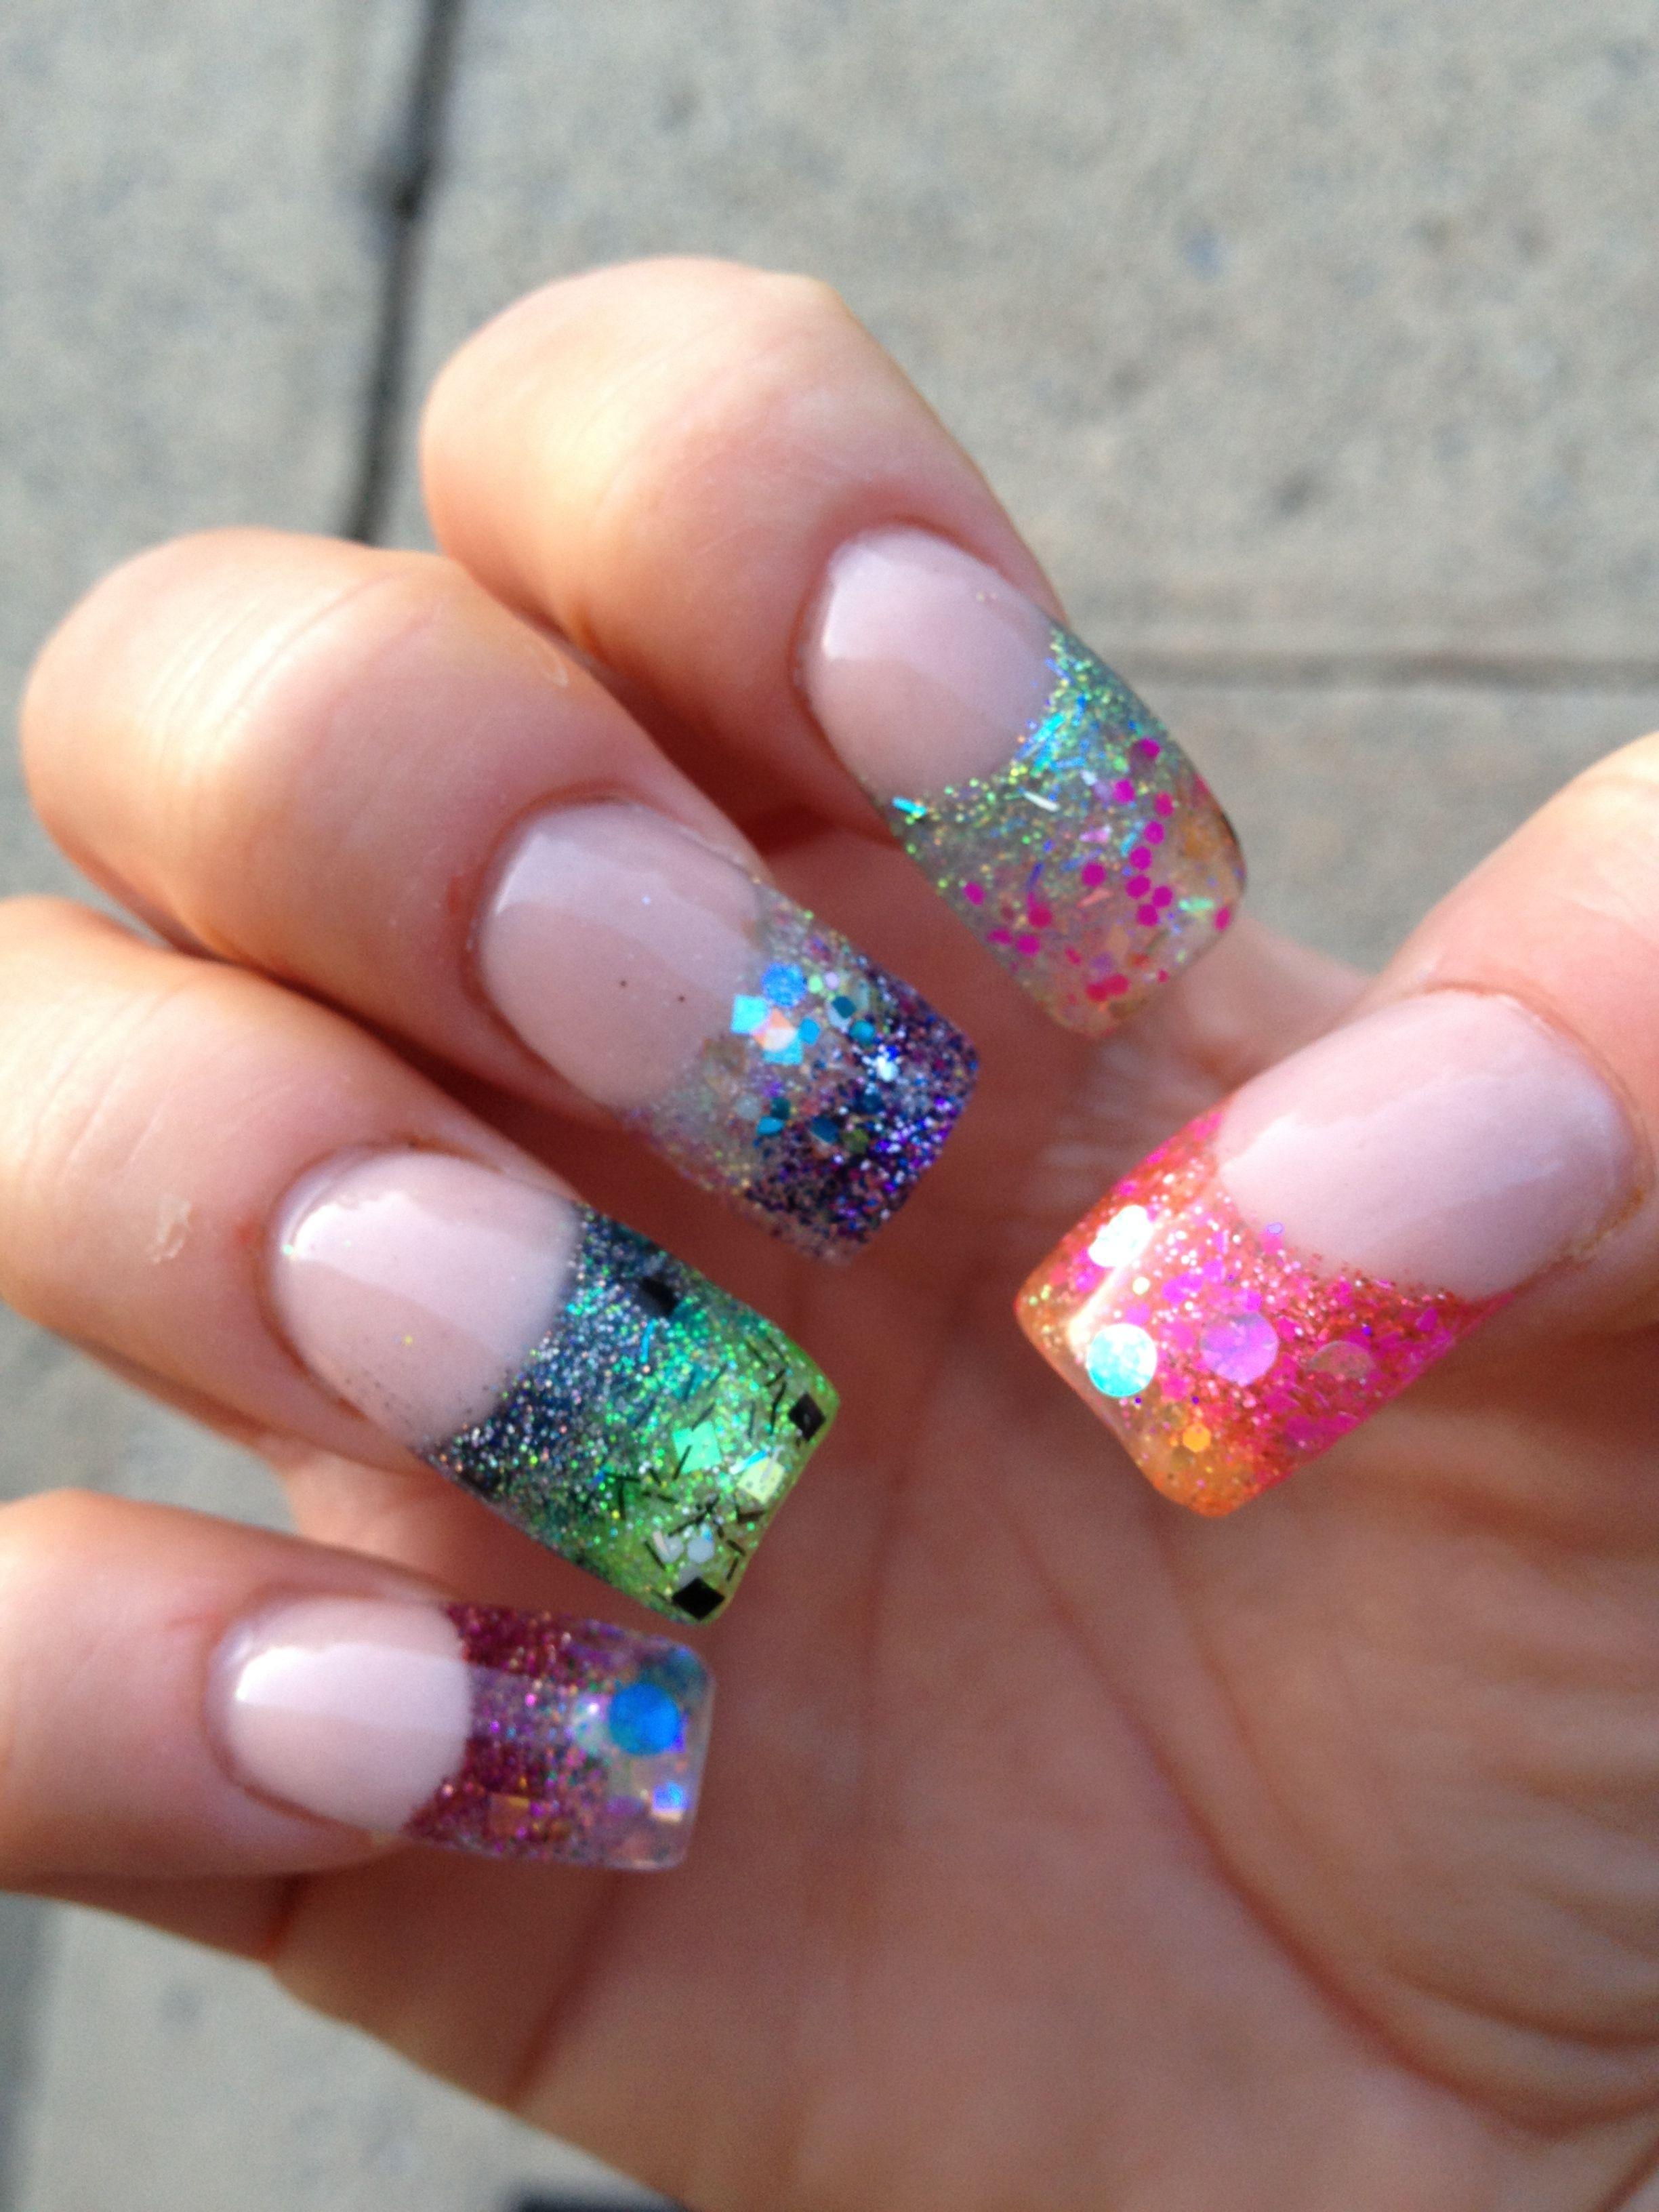 Sculpted colors acrylic nails | Sara\'s nail designs | Pinterest ...